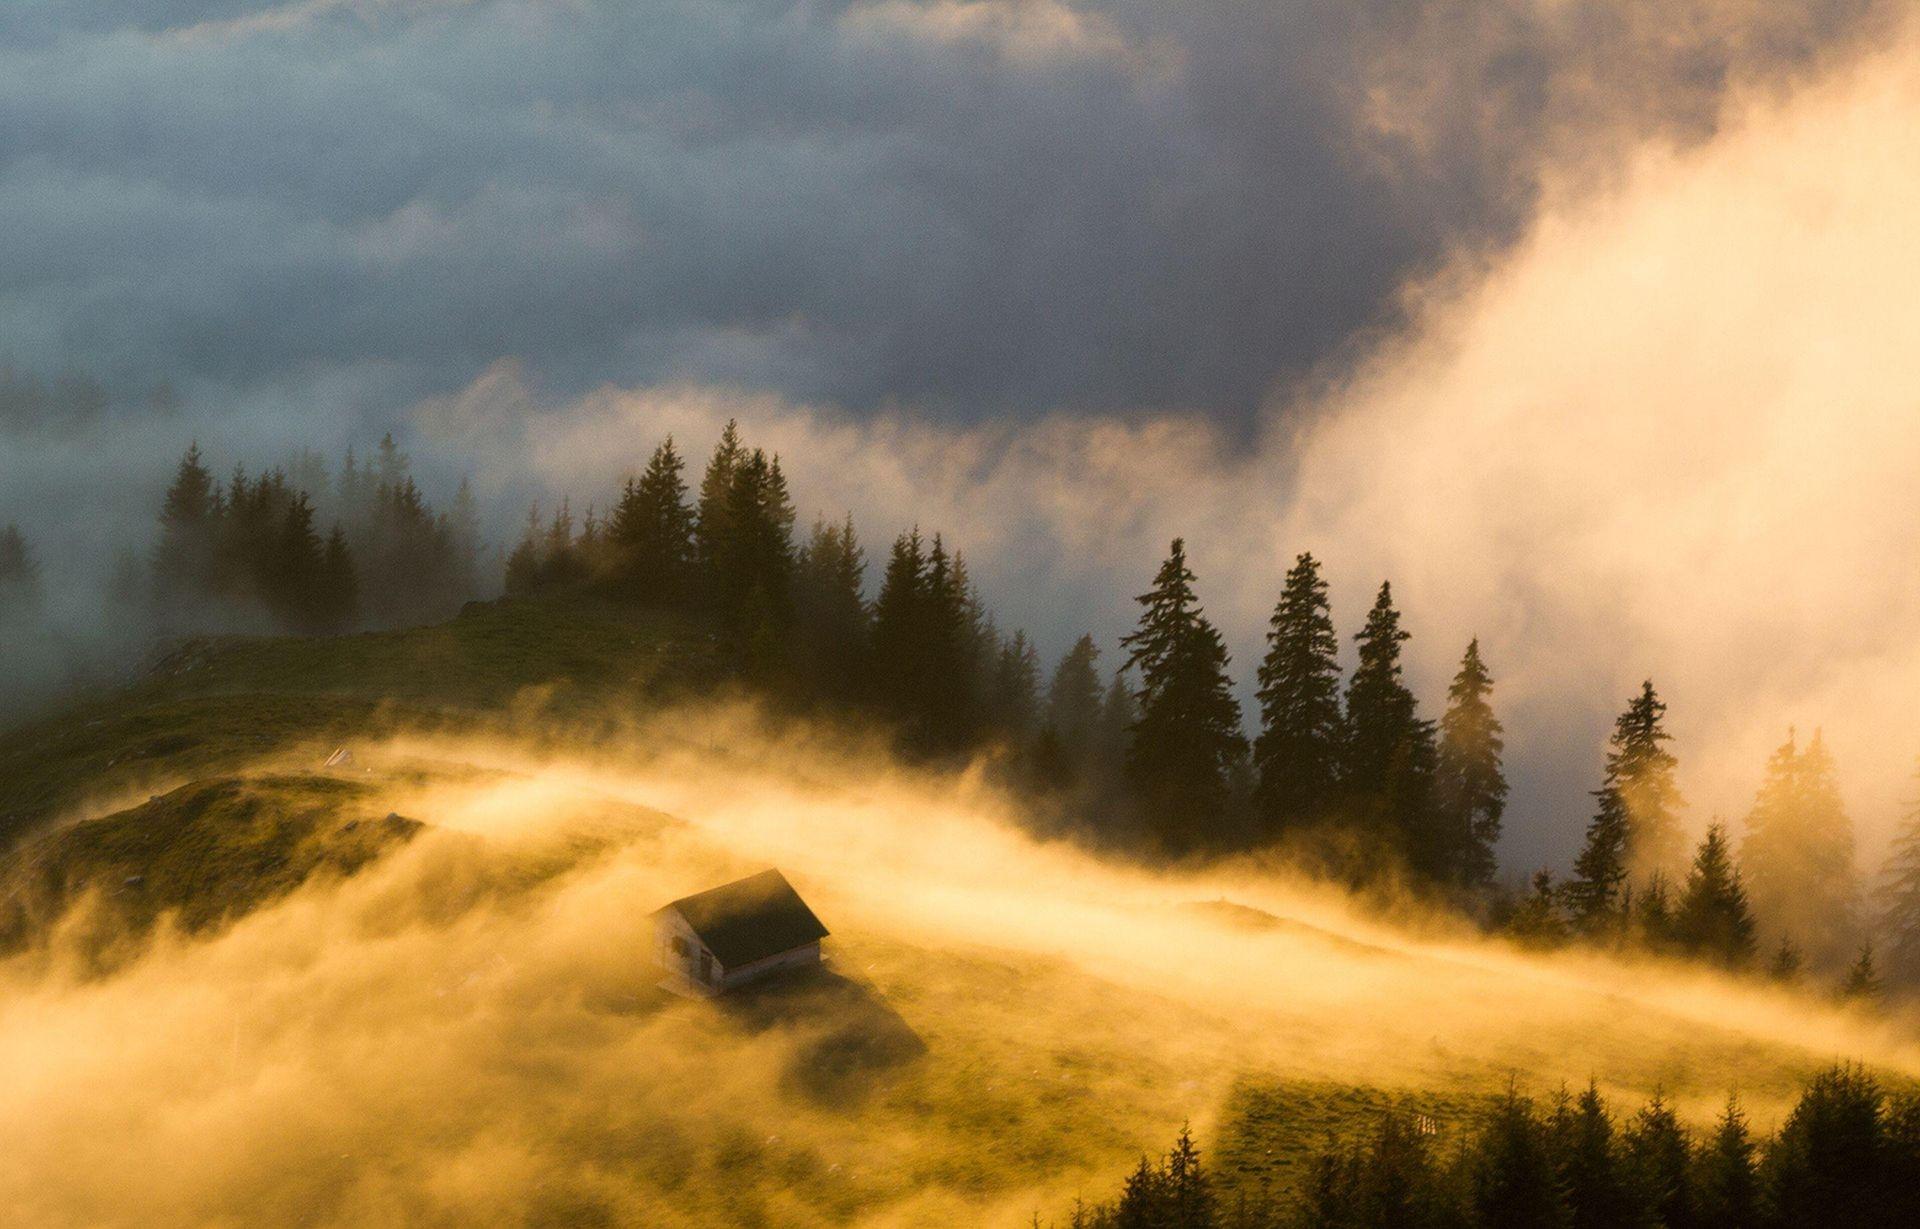 Photograph by  Lazar Ovidiu, National Geographic